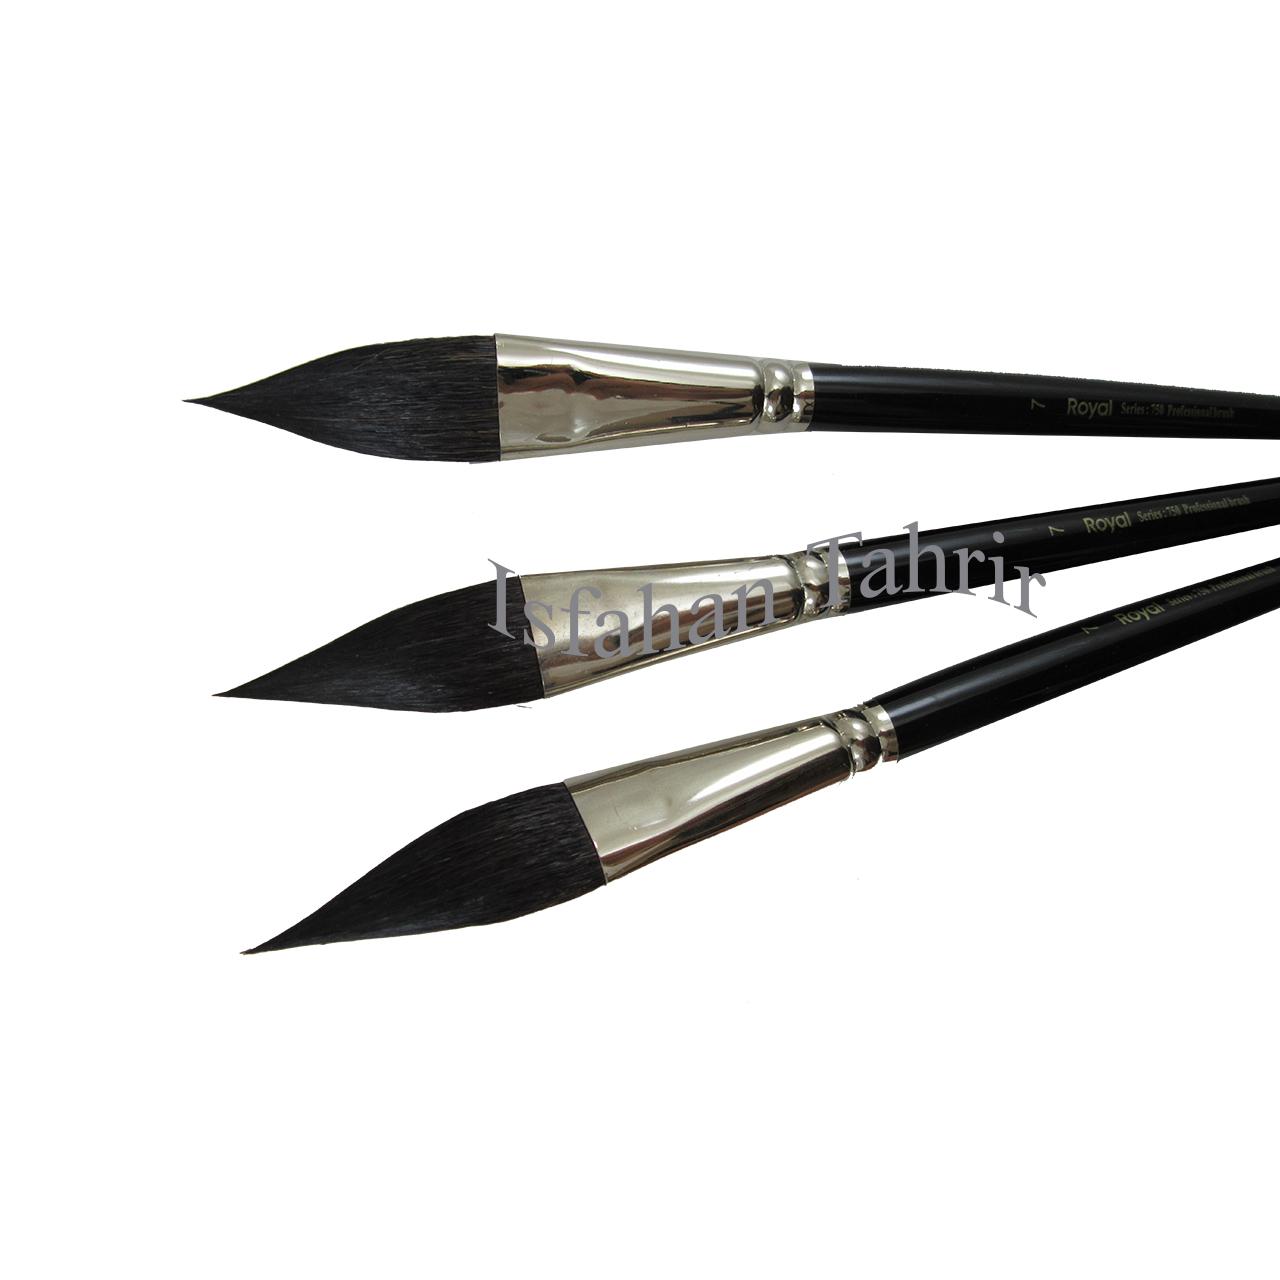 قلم مو رویال سرتیز سری 750 سایز 7